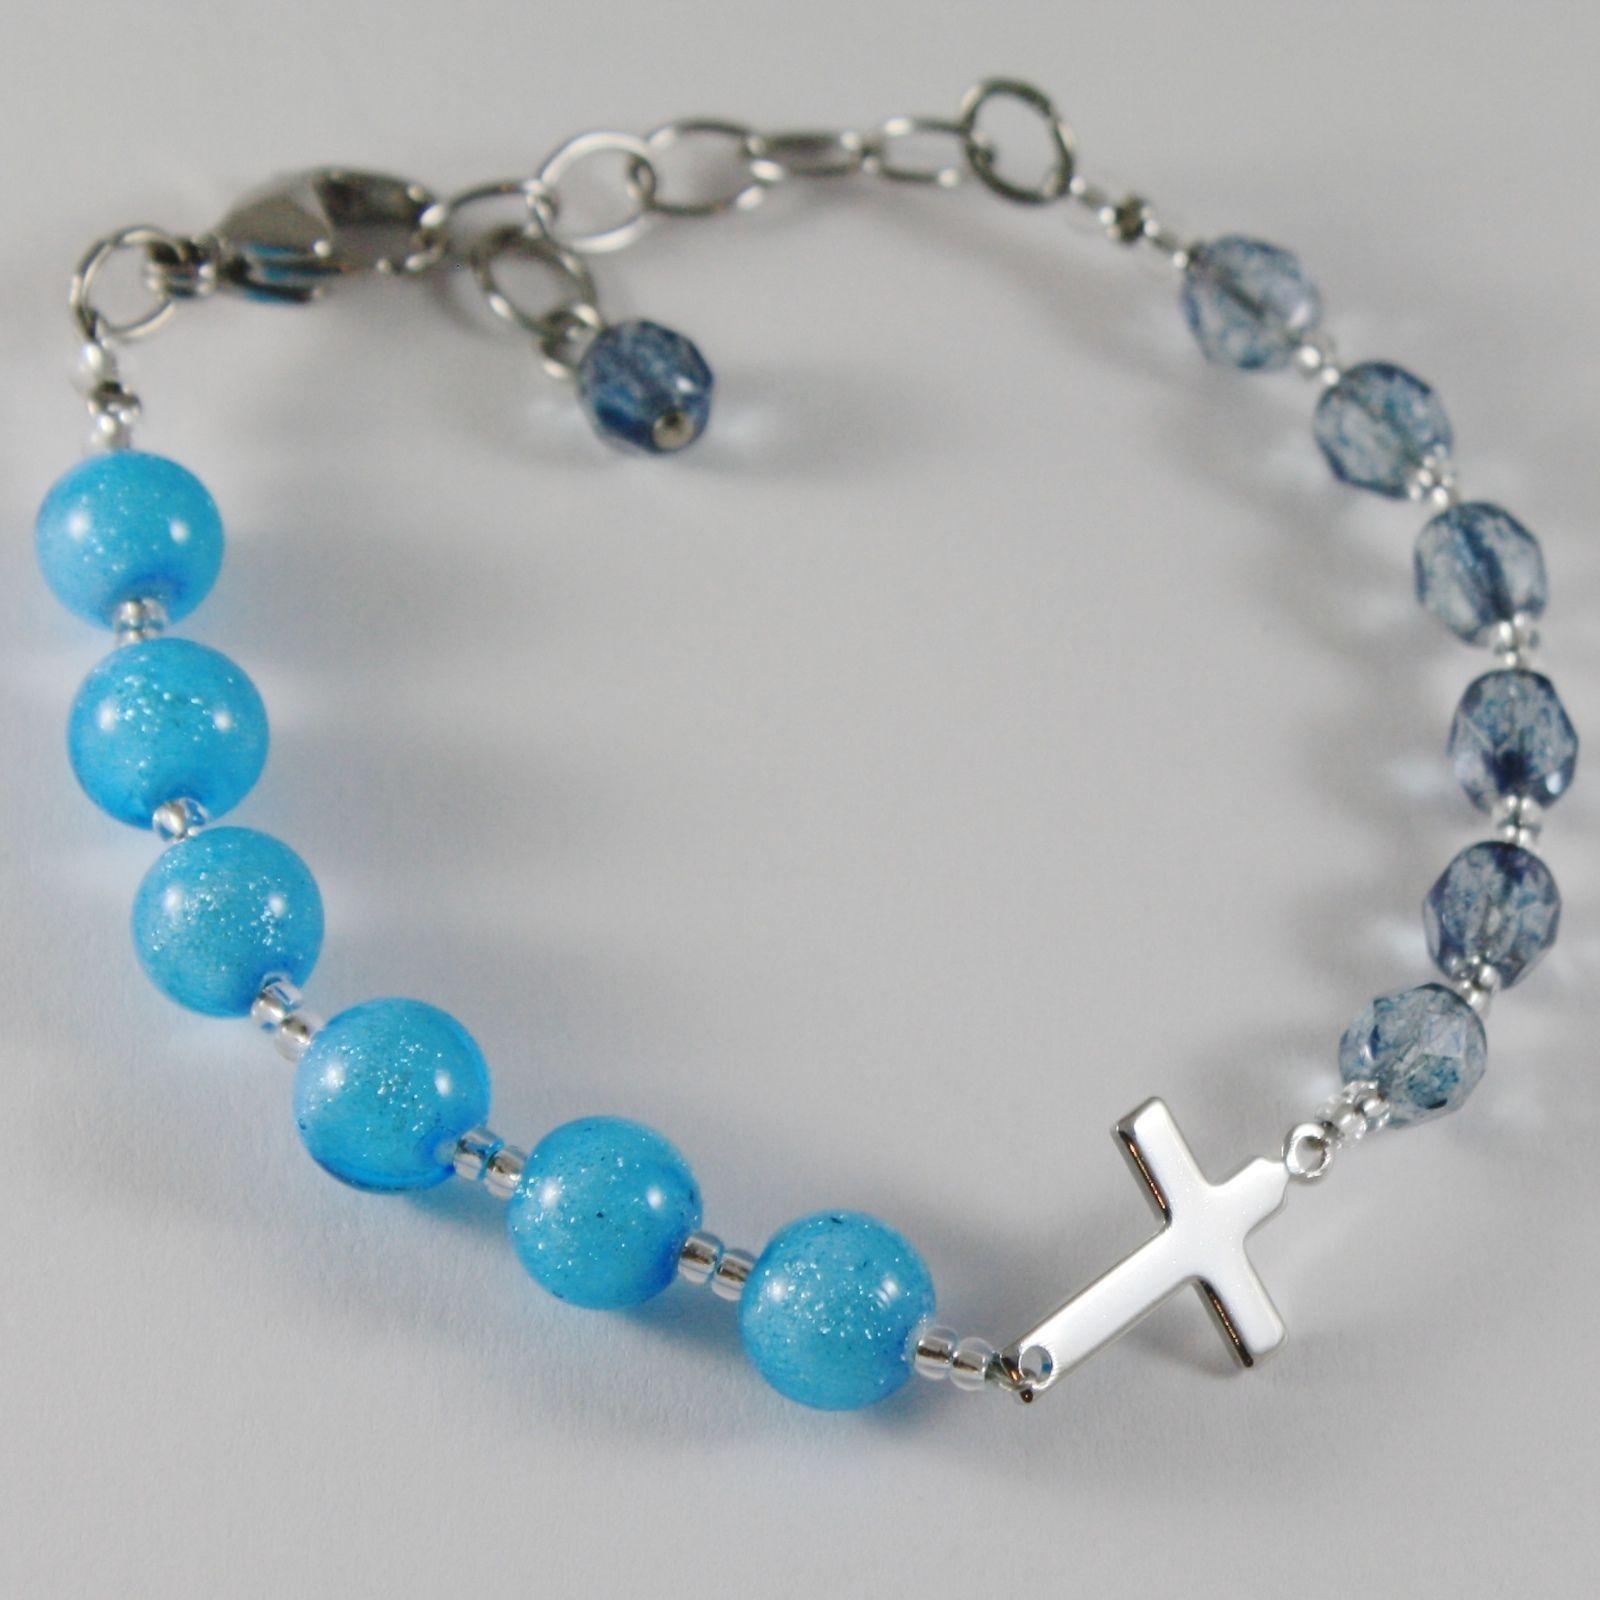 BRACELET ANTICA MURRINA VENEZIA WITH MURANO GLASS BLUE AND LIGHT BLUE WITH CROSS